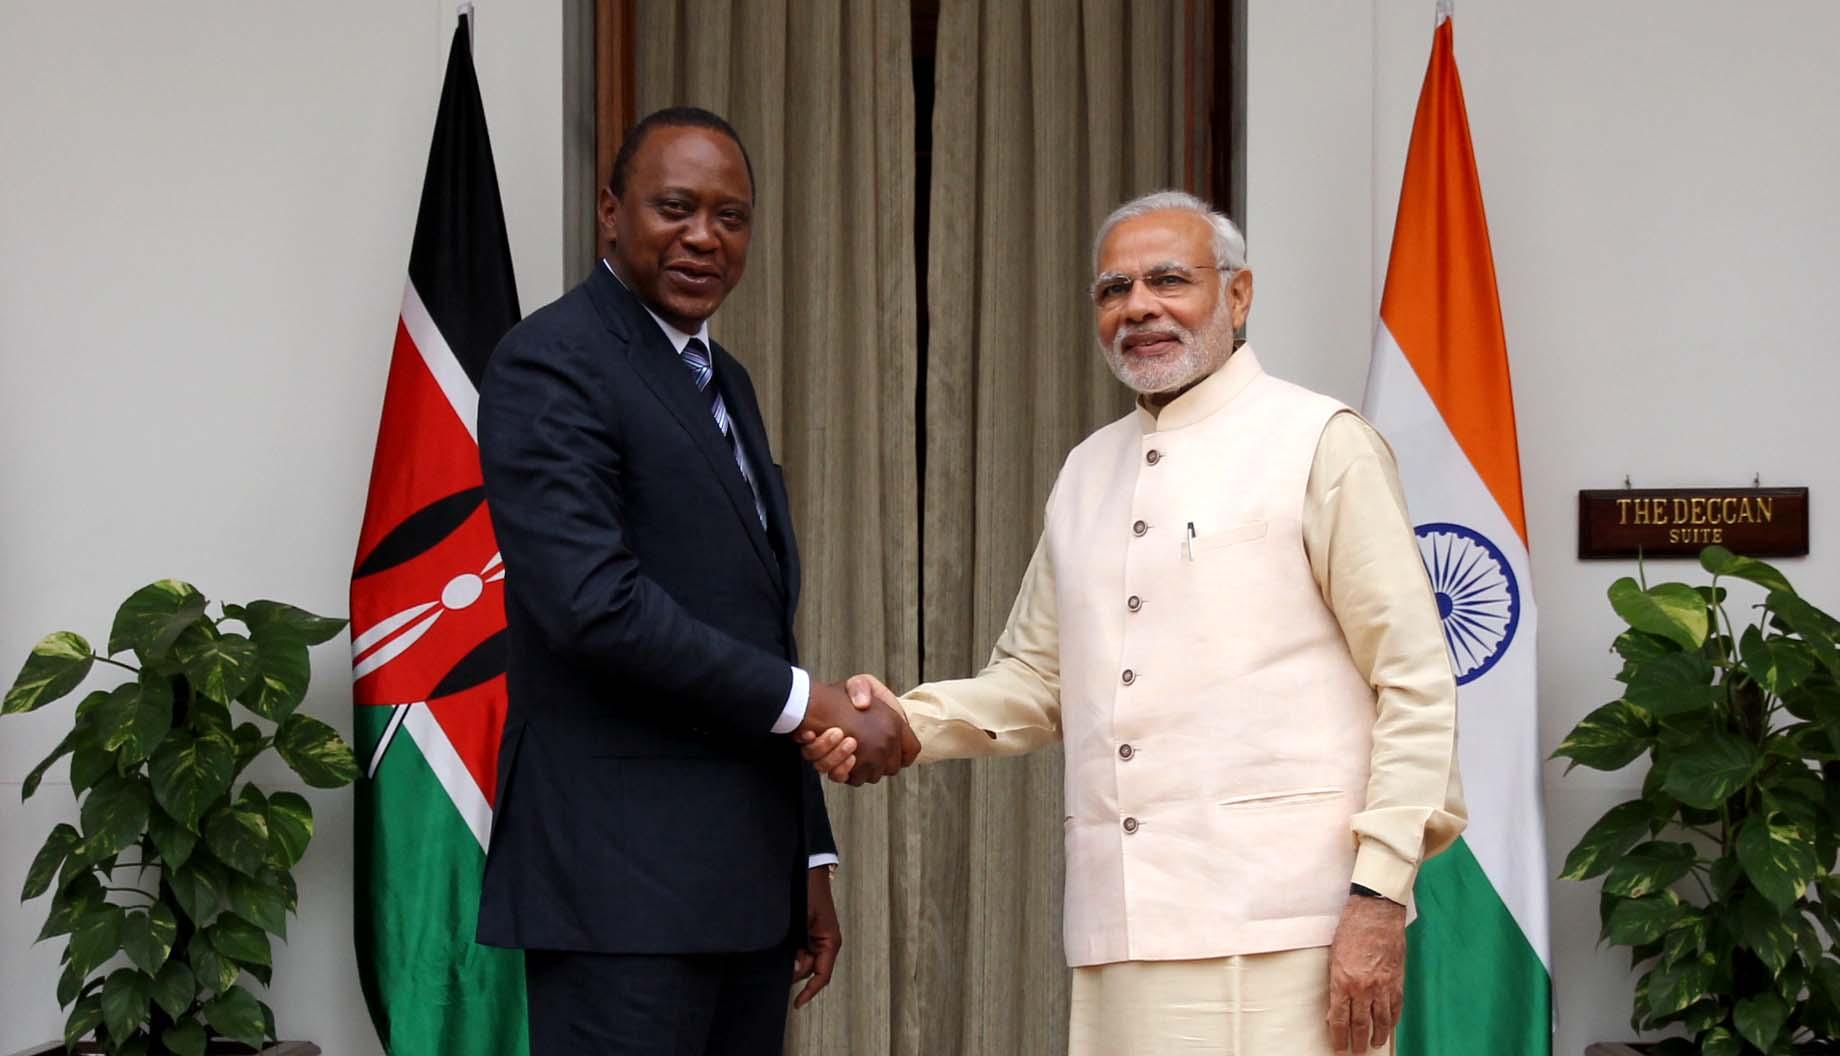 Prime Minister Narendra Modi with Kenyan President Uhuru Kenyatta. Credit: MEA